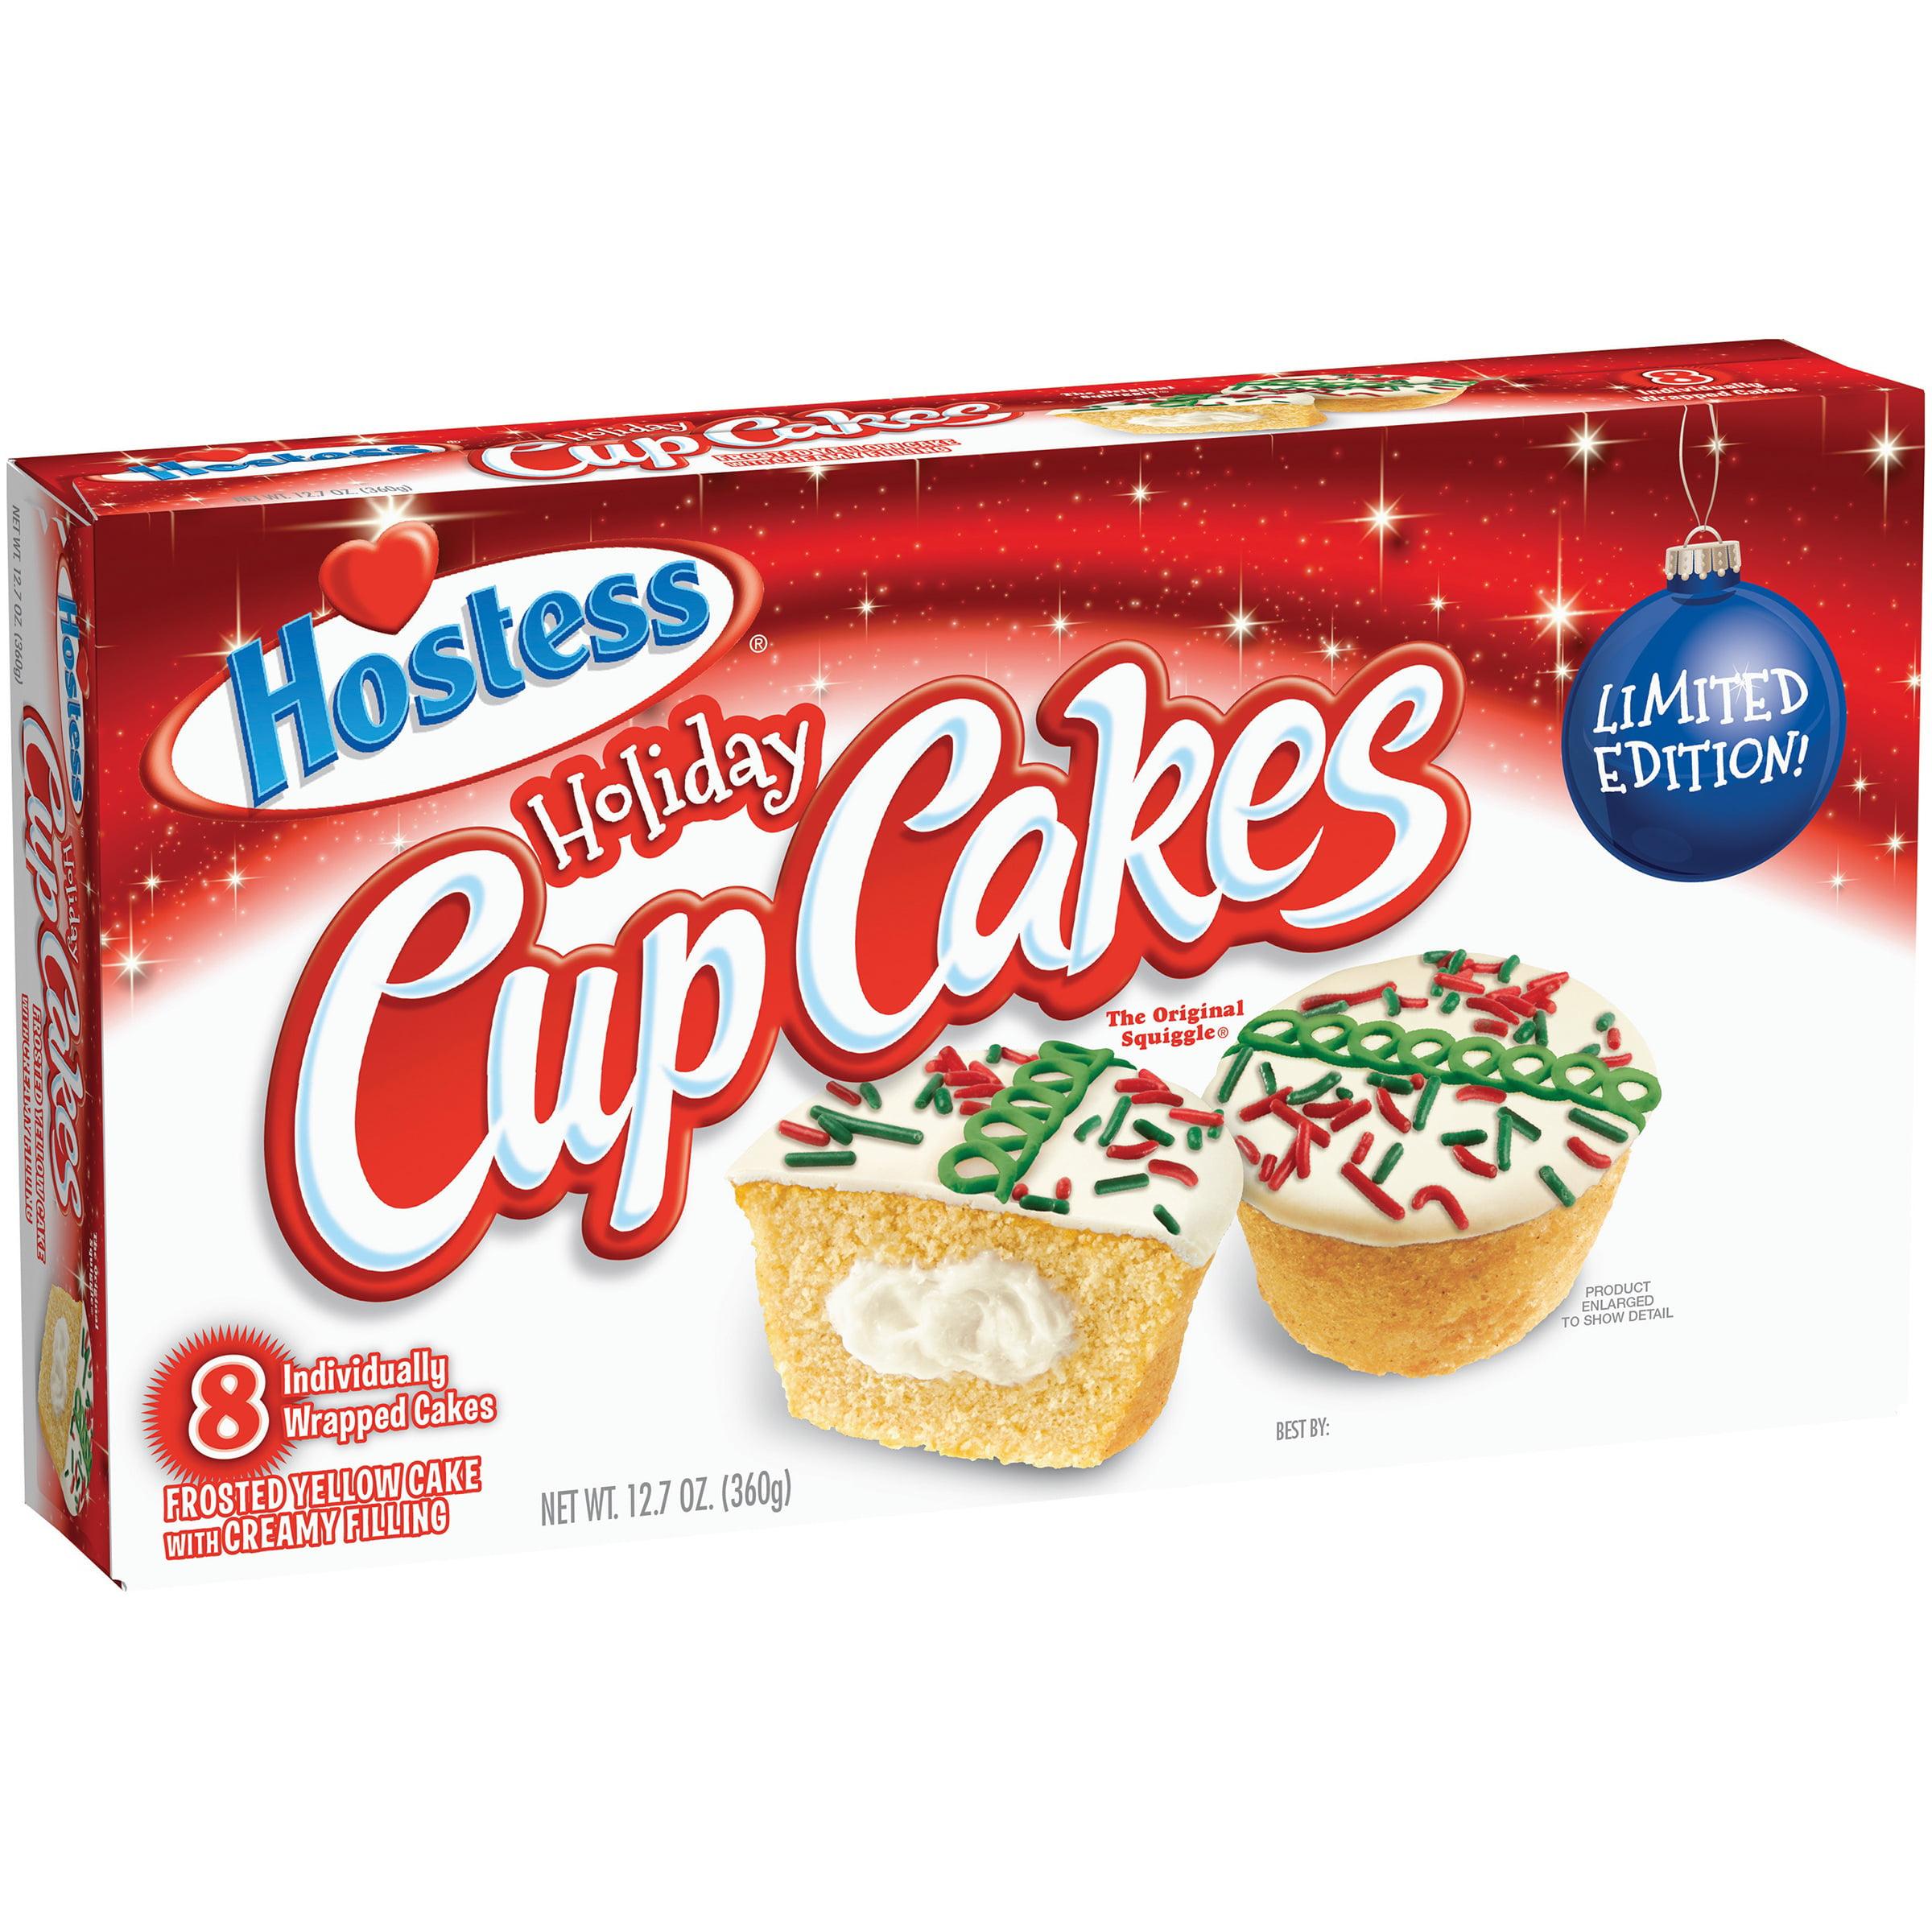 Hostess® Holiday Cup Cakes 12.7 oz. Box